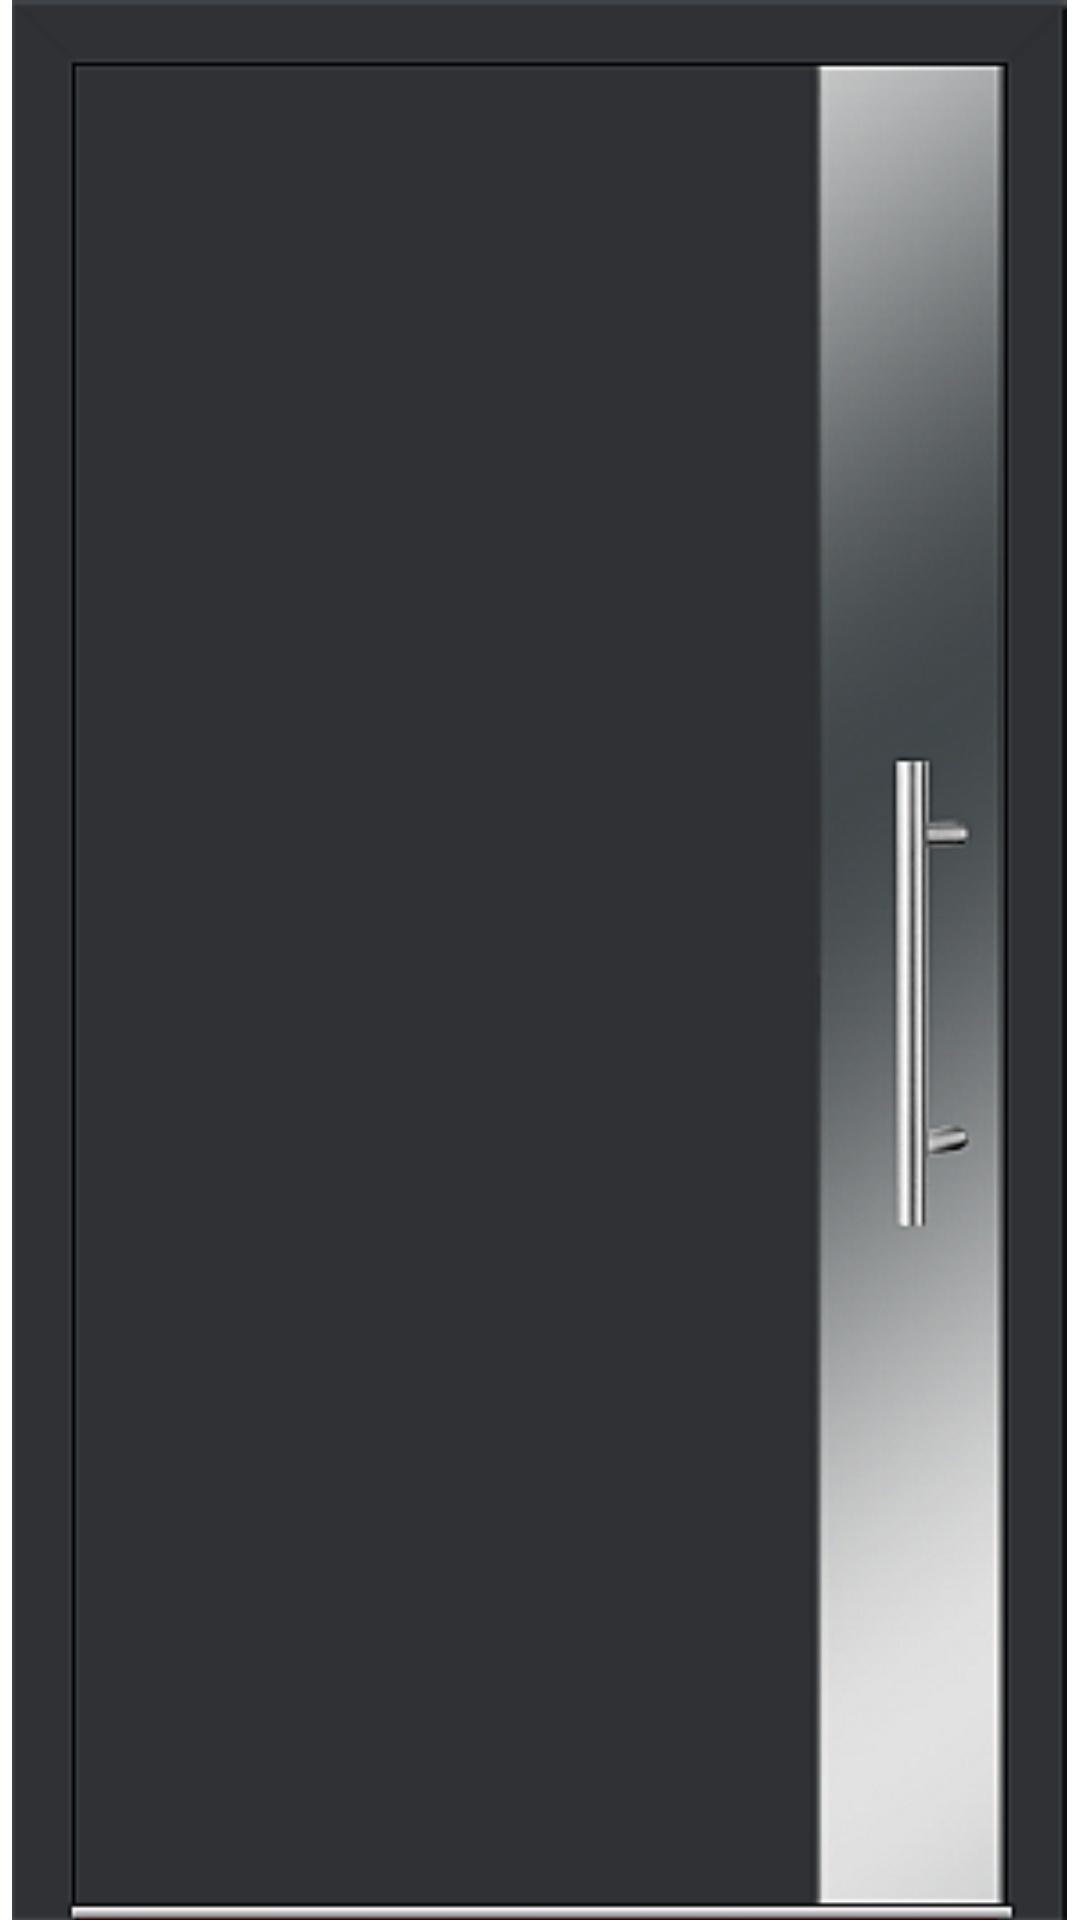 Aluminium Haustür Modell 6903-97 schwarz